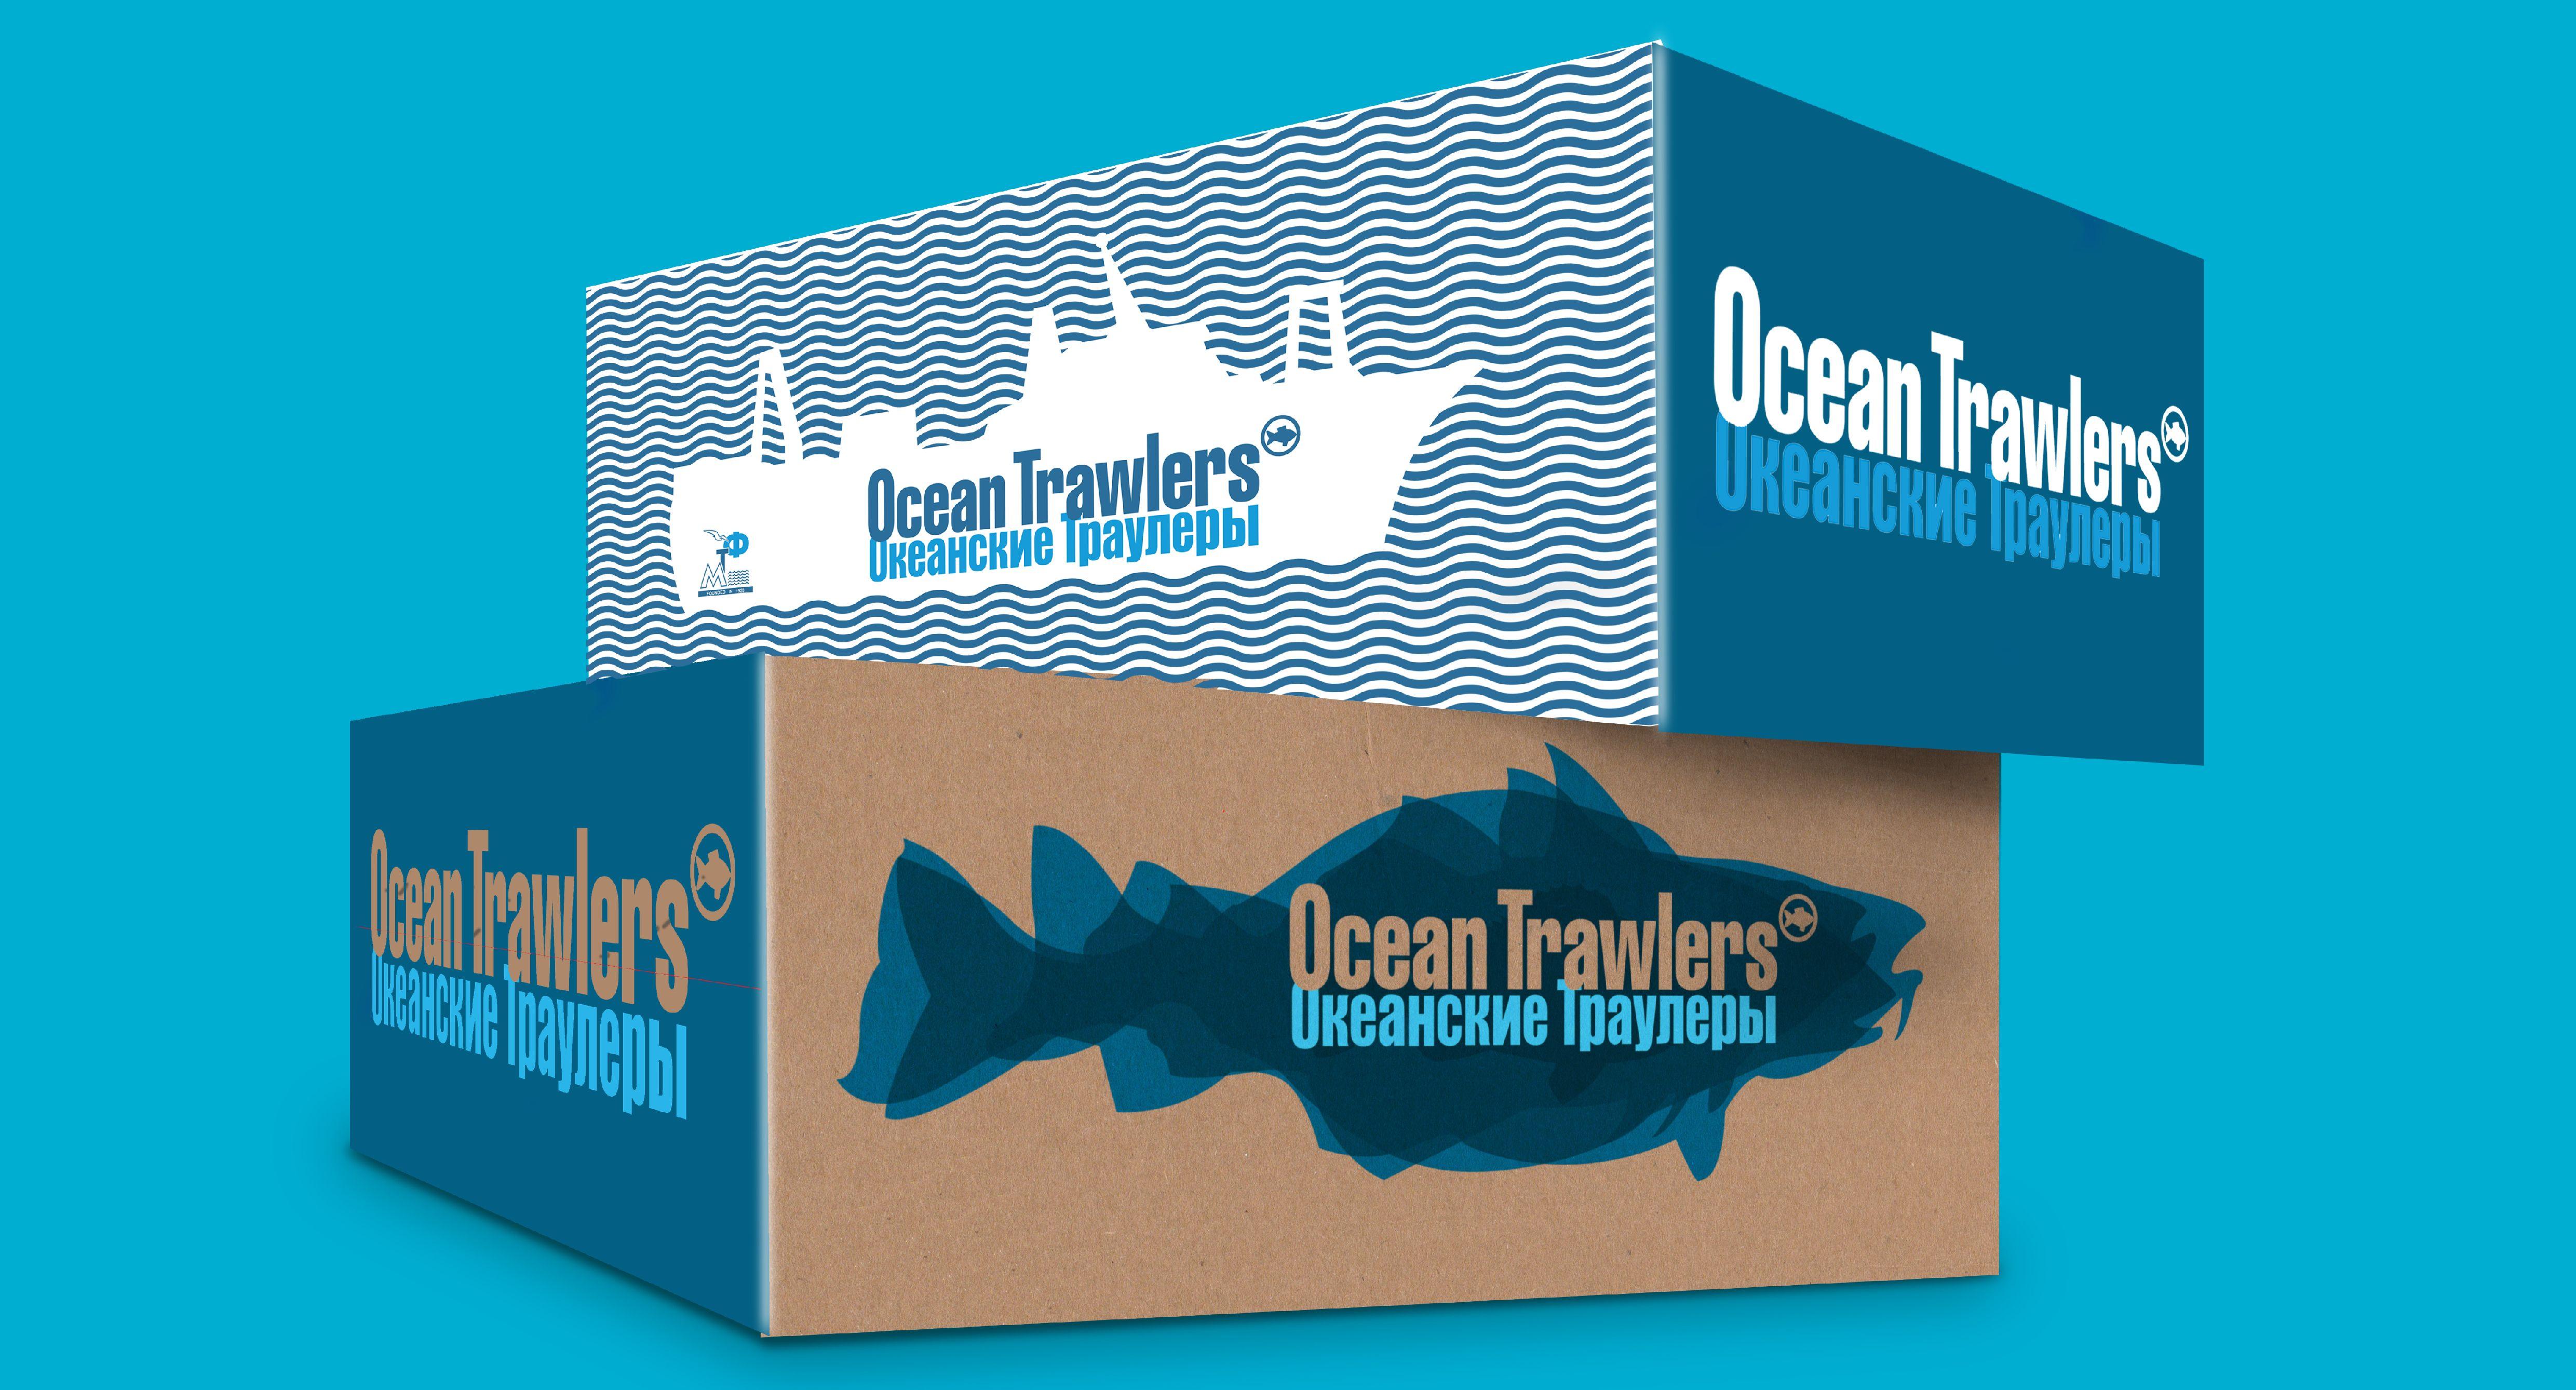 Ocean Trawlers #packagingdesign by Carter Wong design